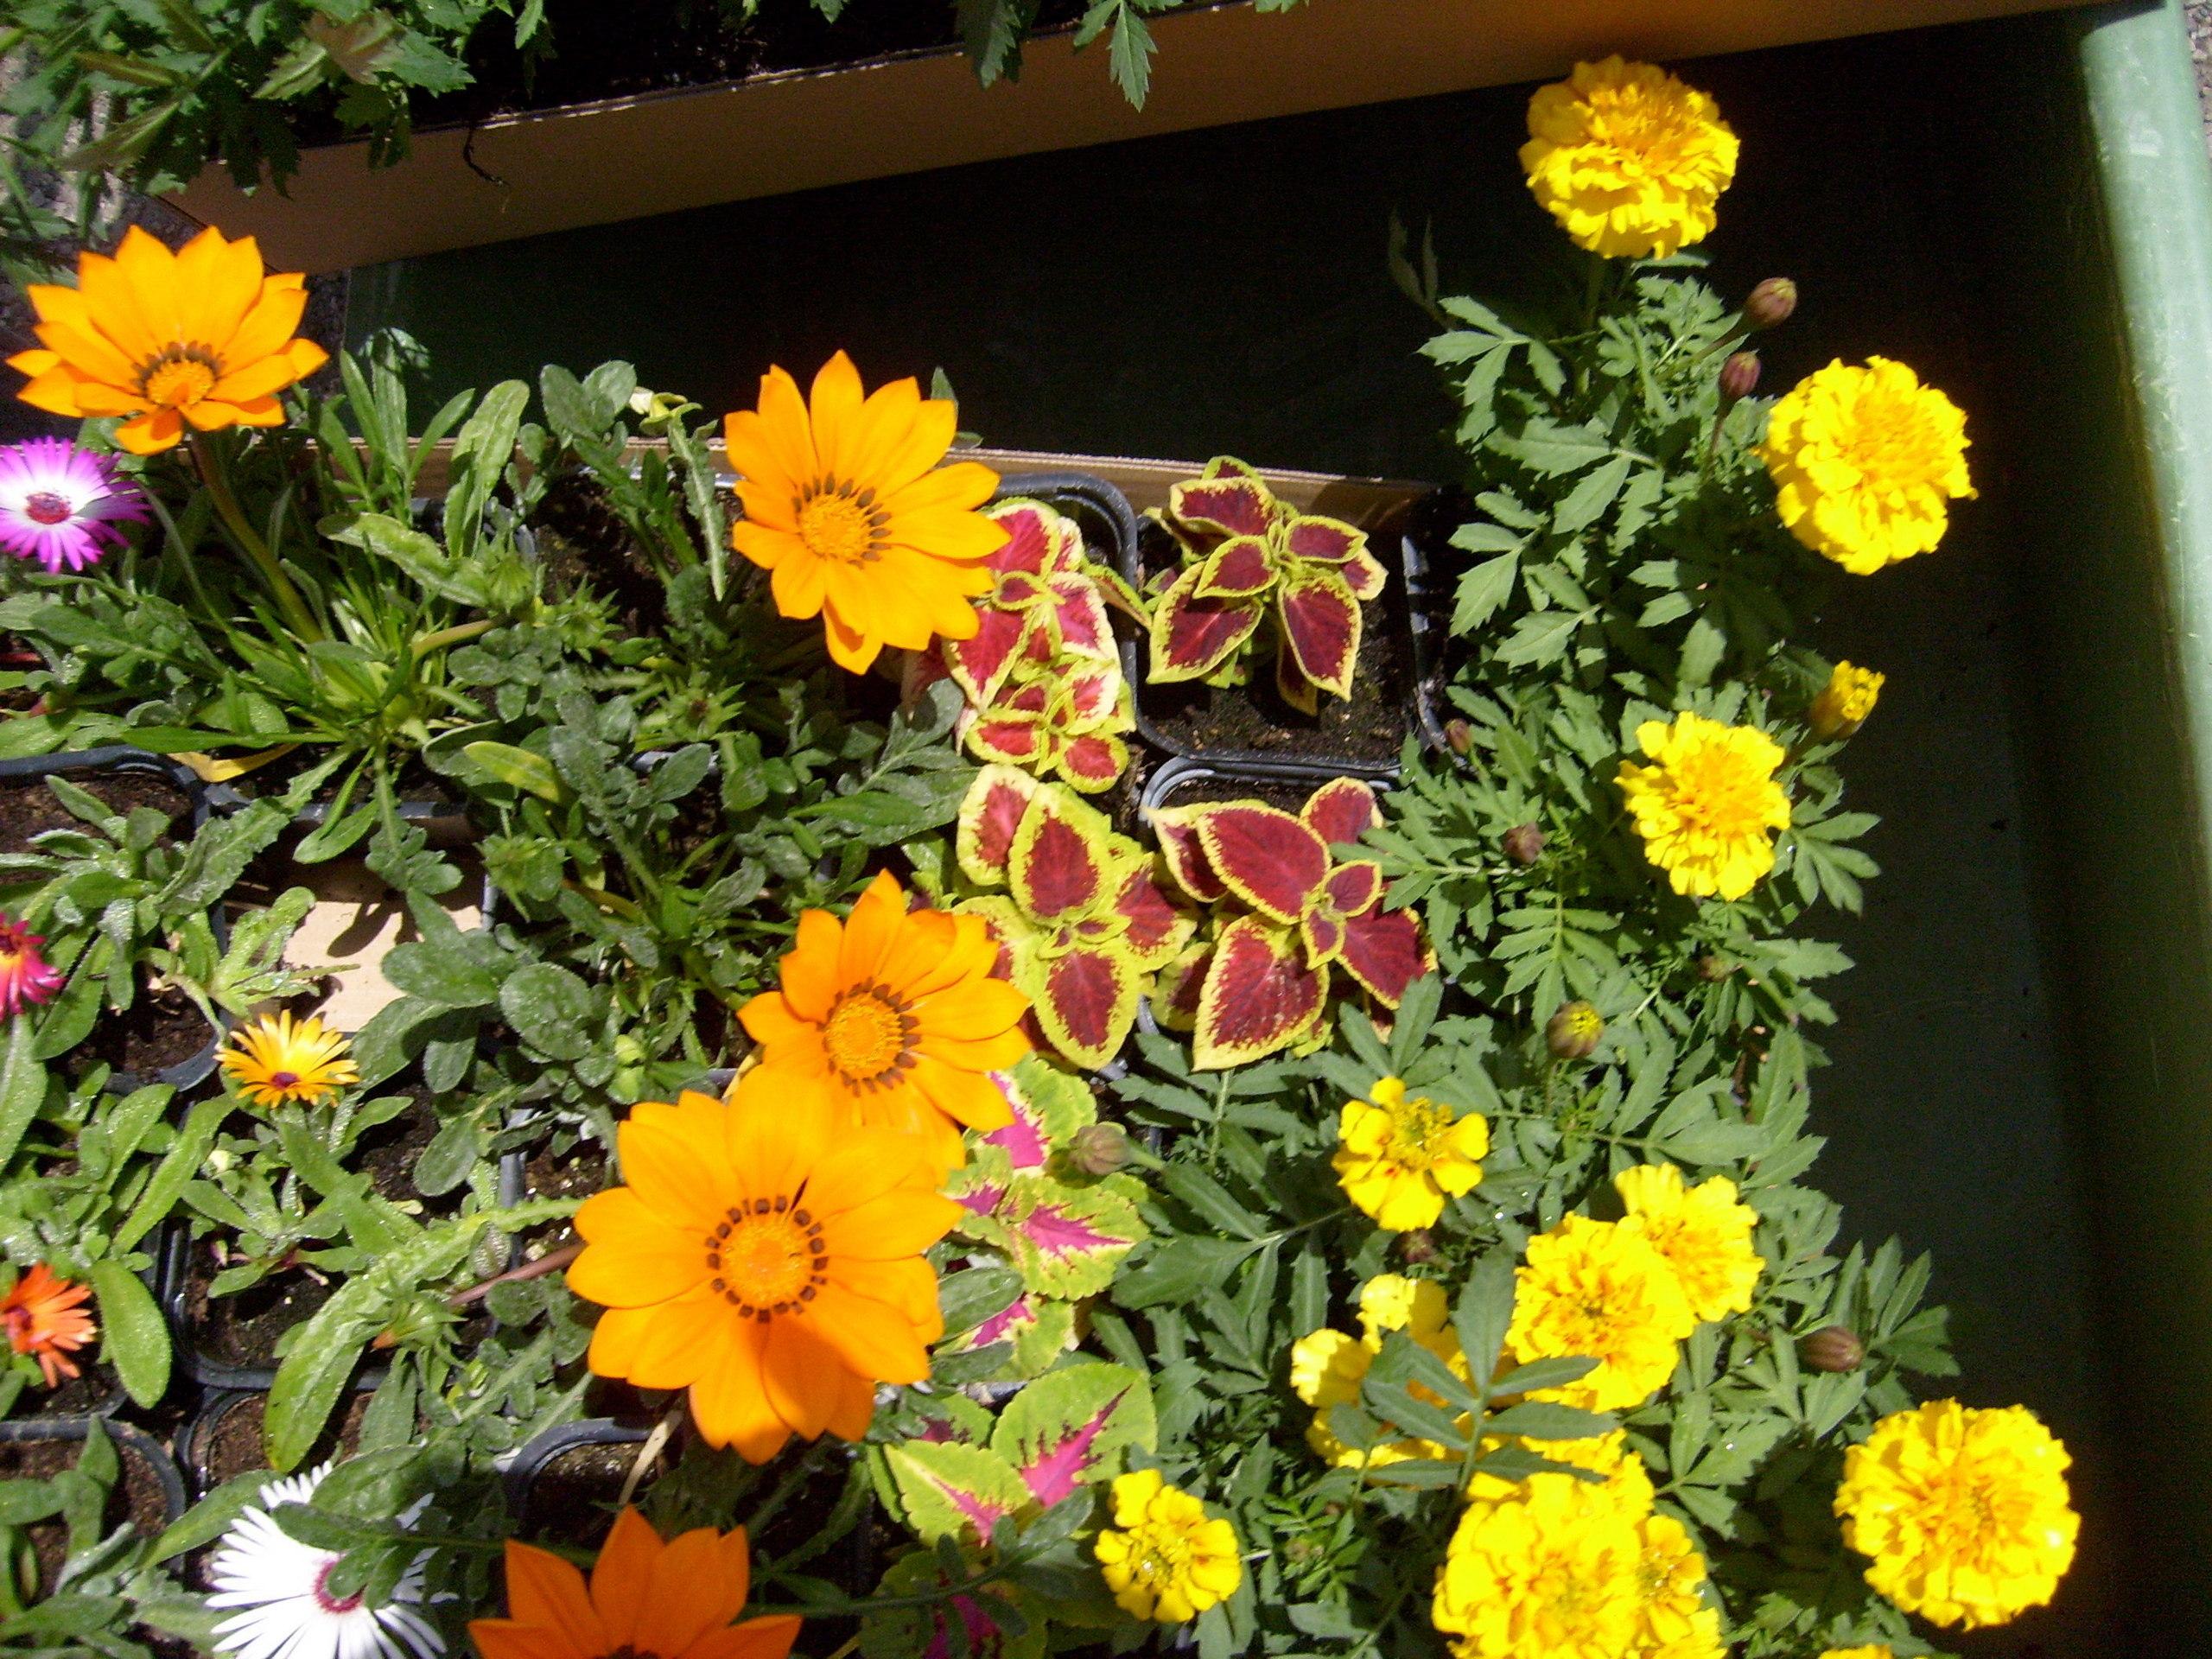 Spring Flowers Gardening Wallpaper 1417287 Fanpop